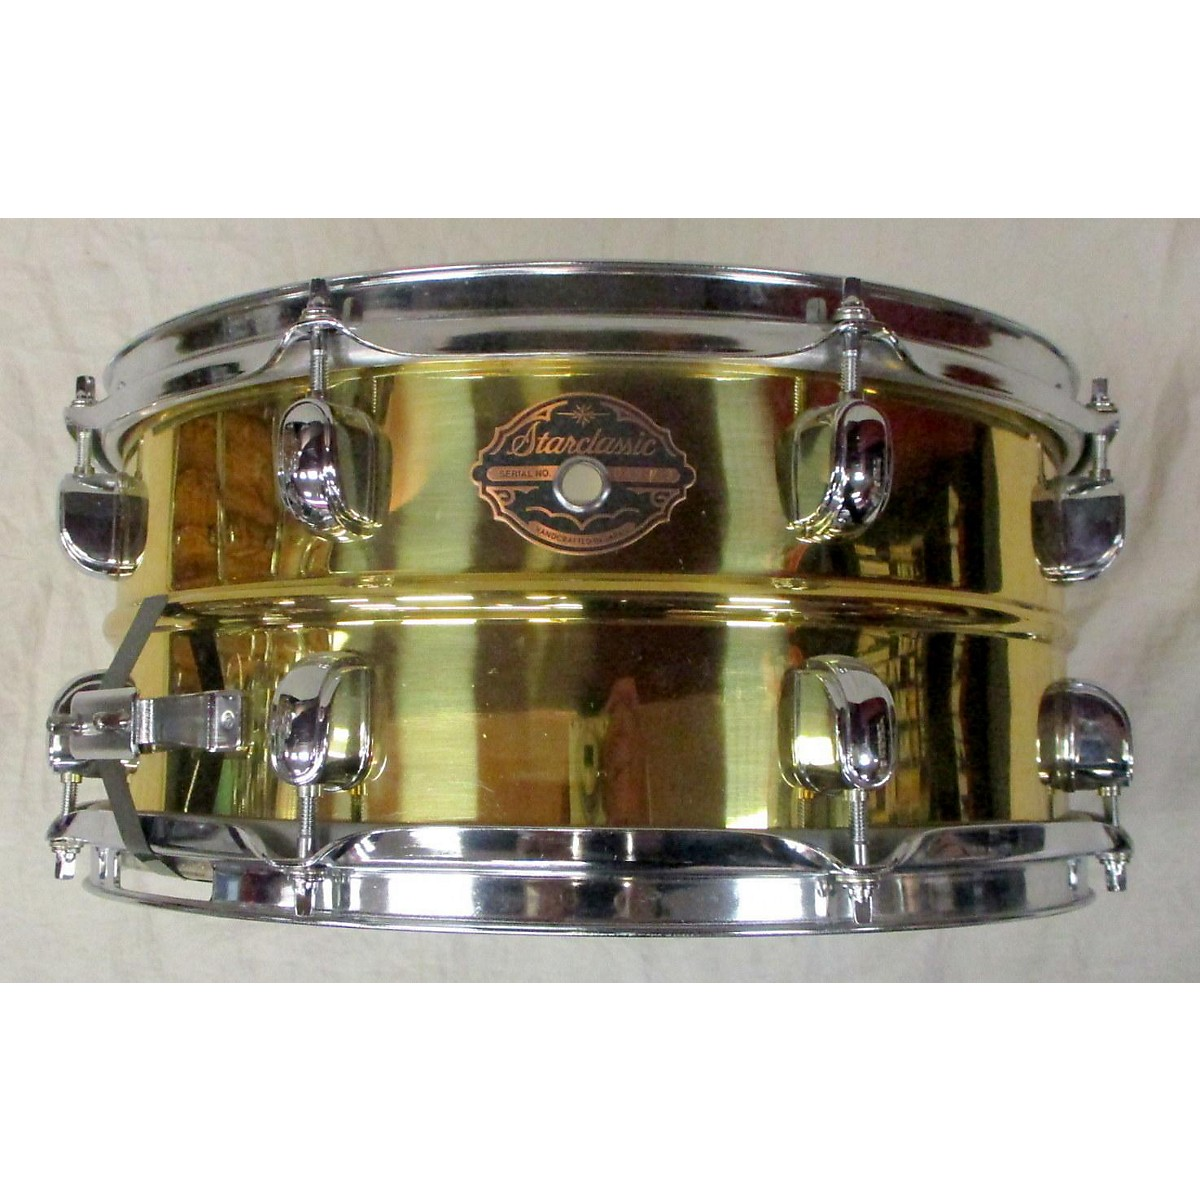 TAMA 6.5X14 Starclassic Brass Snare Drum